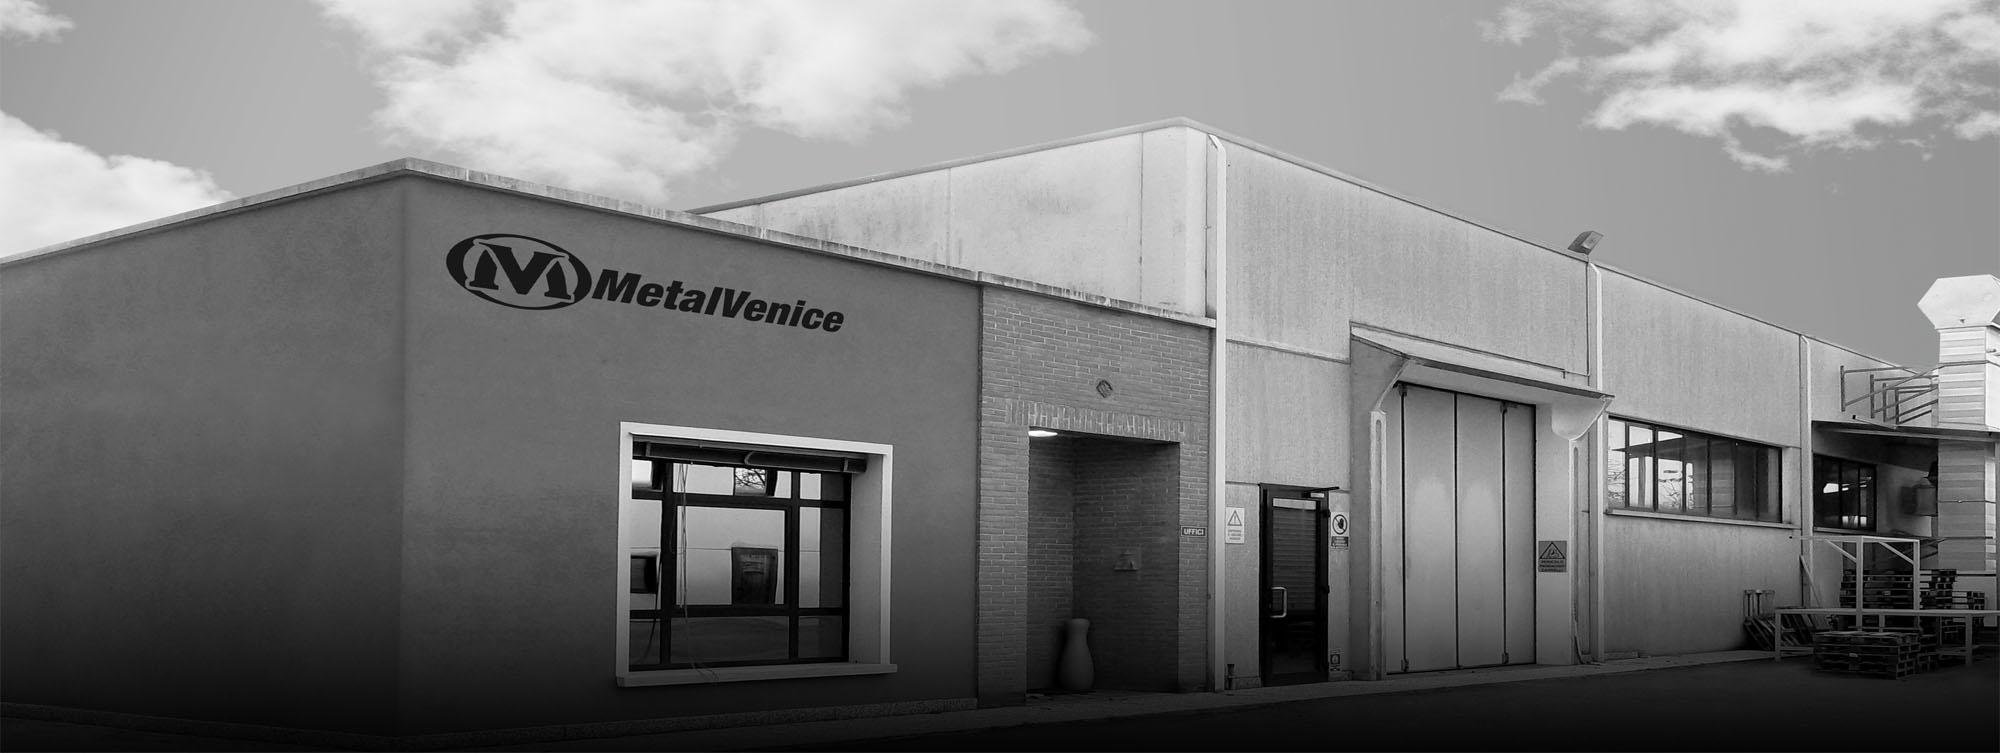 metalvenice-azienda-verniciatura-liquido